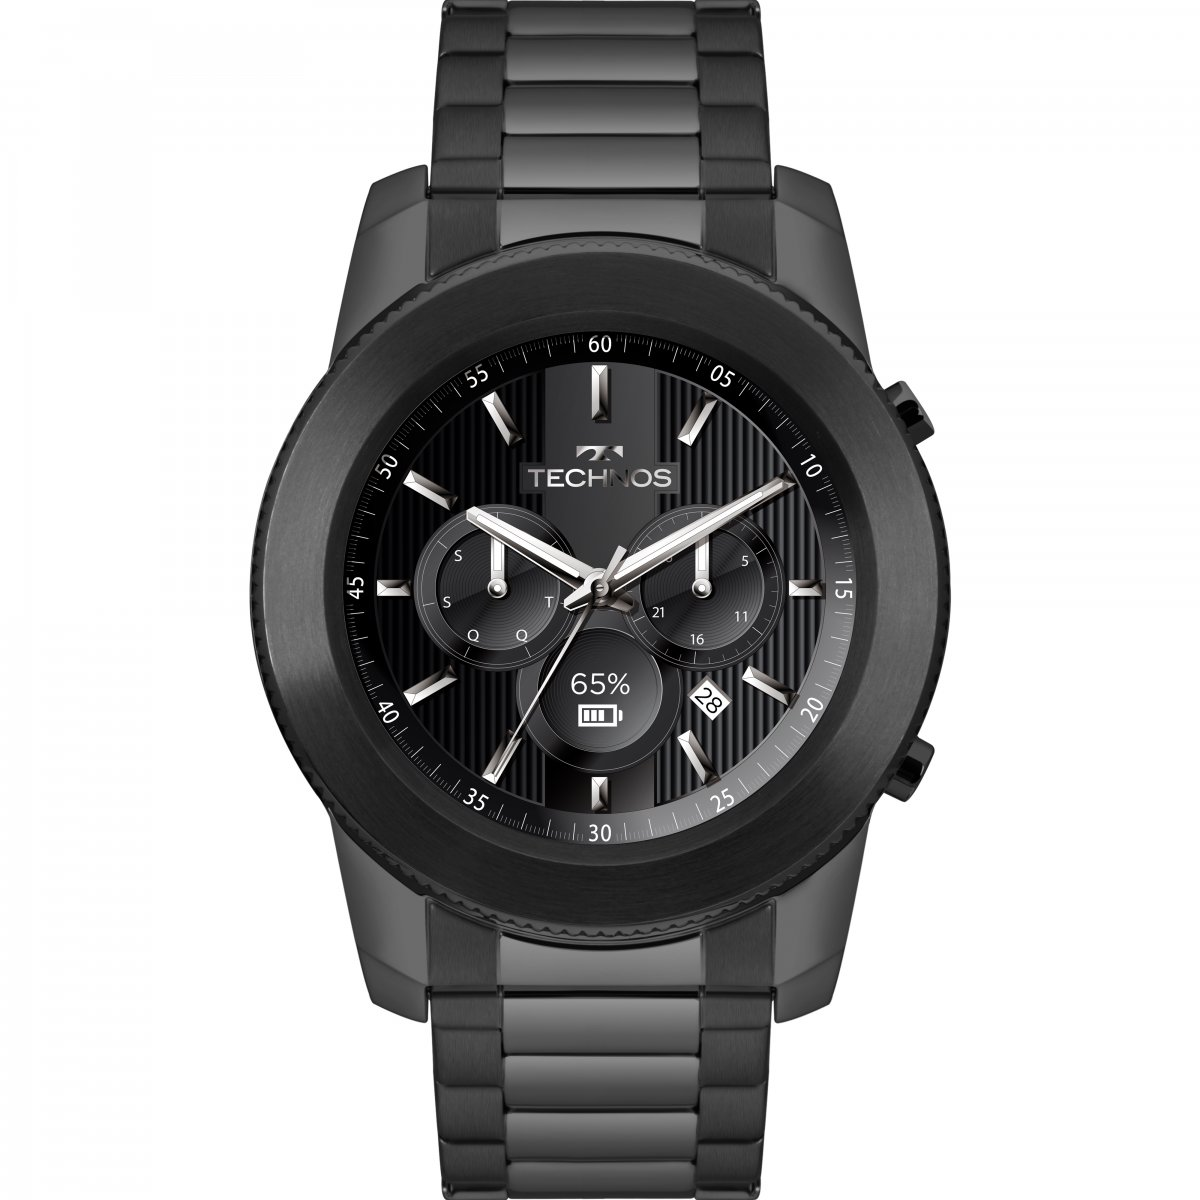 b5a8468dea256 Relógio Masculino · Technos · Relógio Technos Connect 3+ M1AB 4P